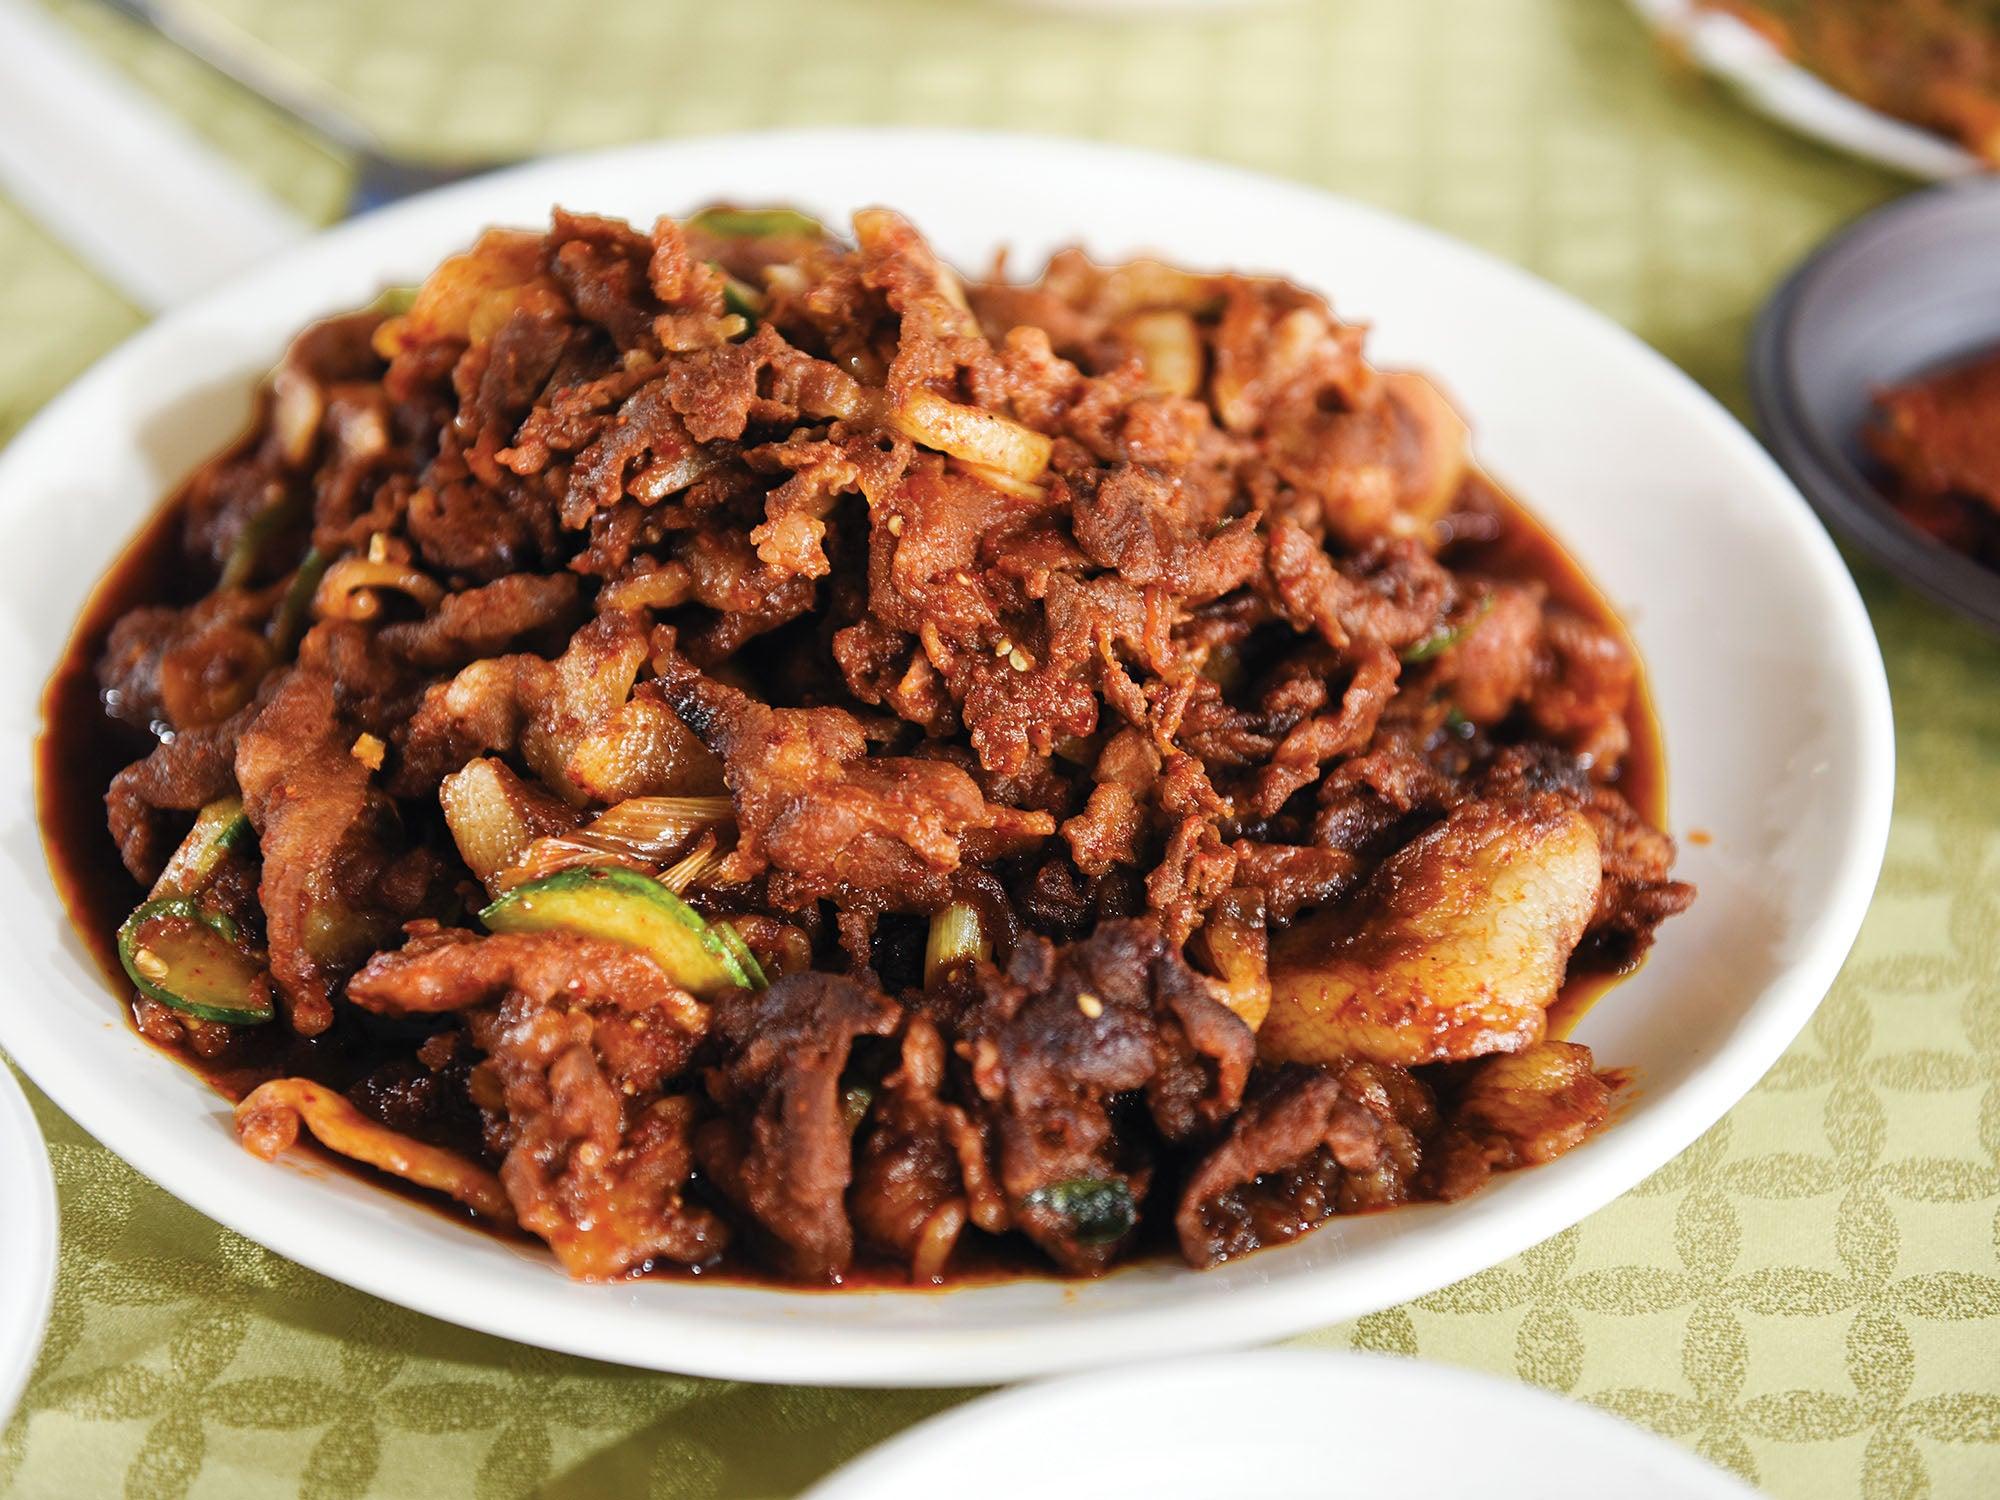 jeyuk bokkeum stir fried pork